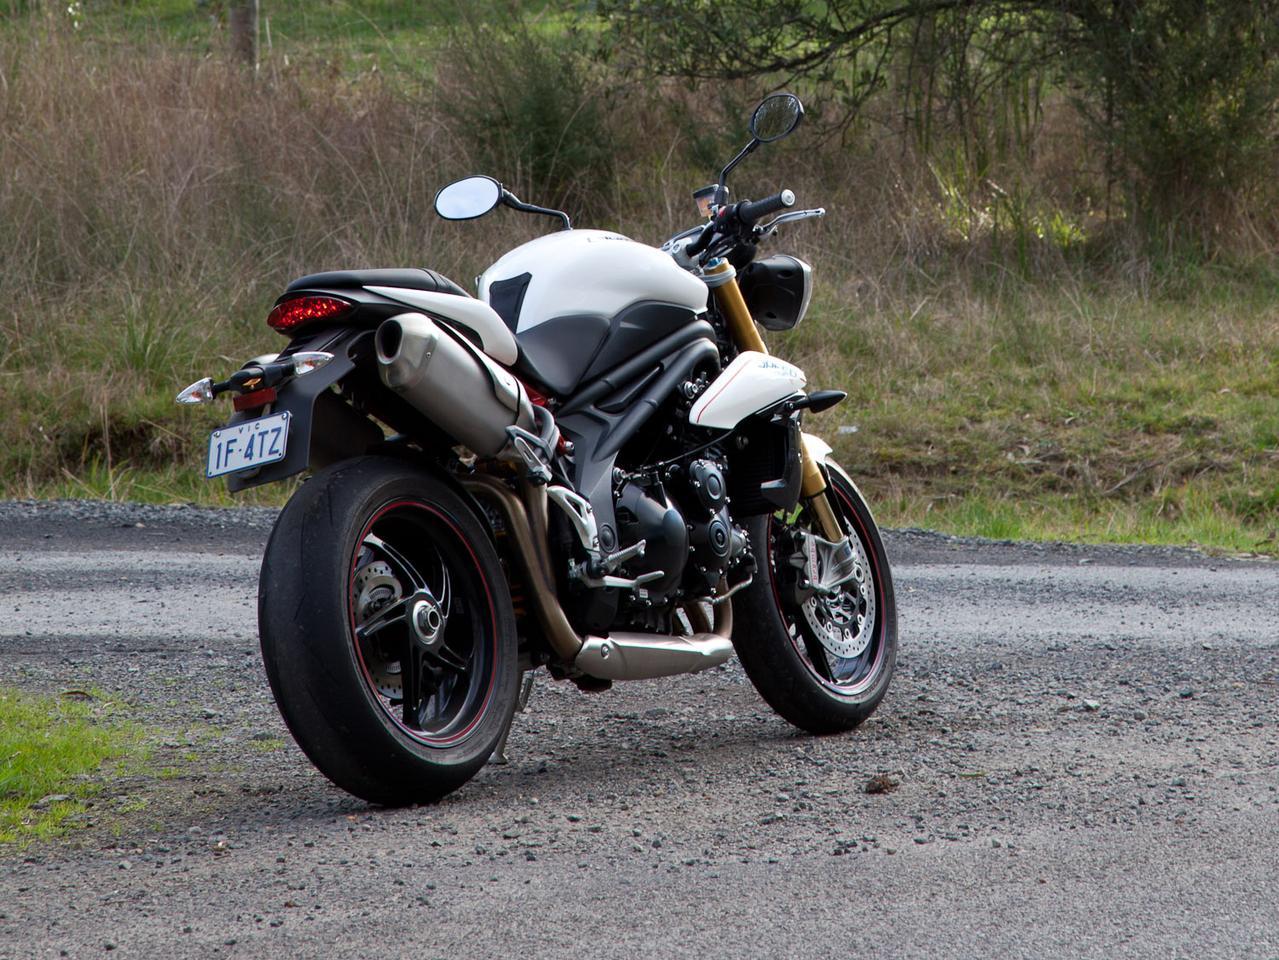 Triumph's Speed Triple R